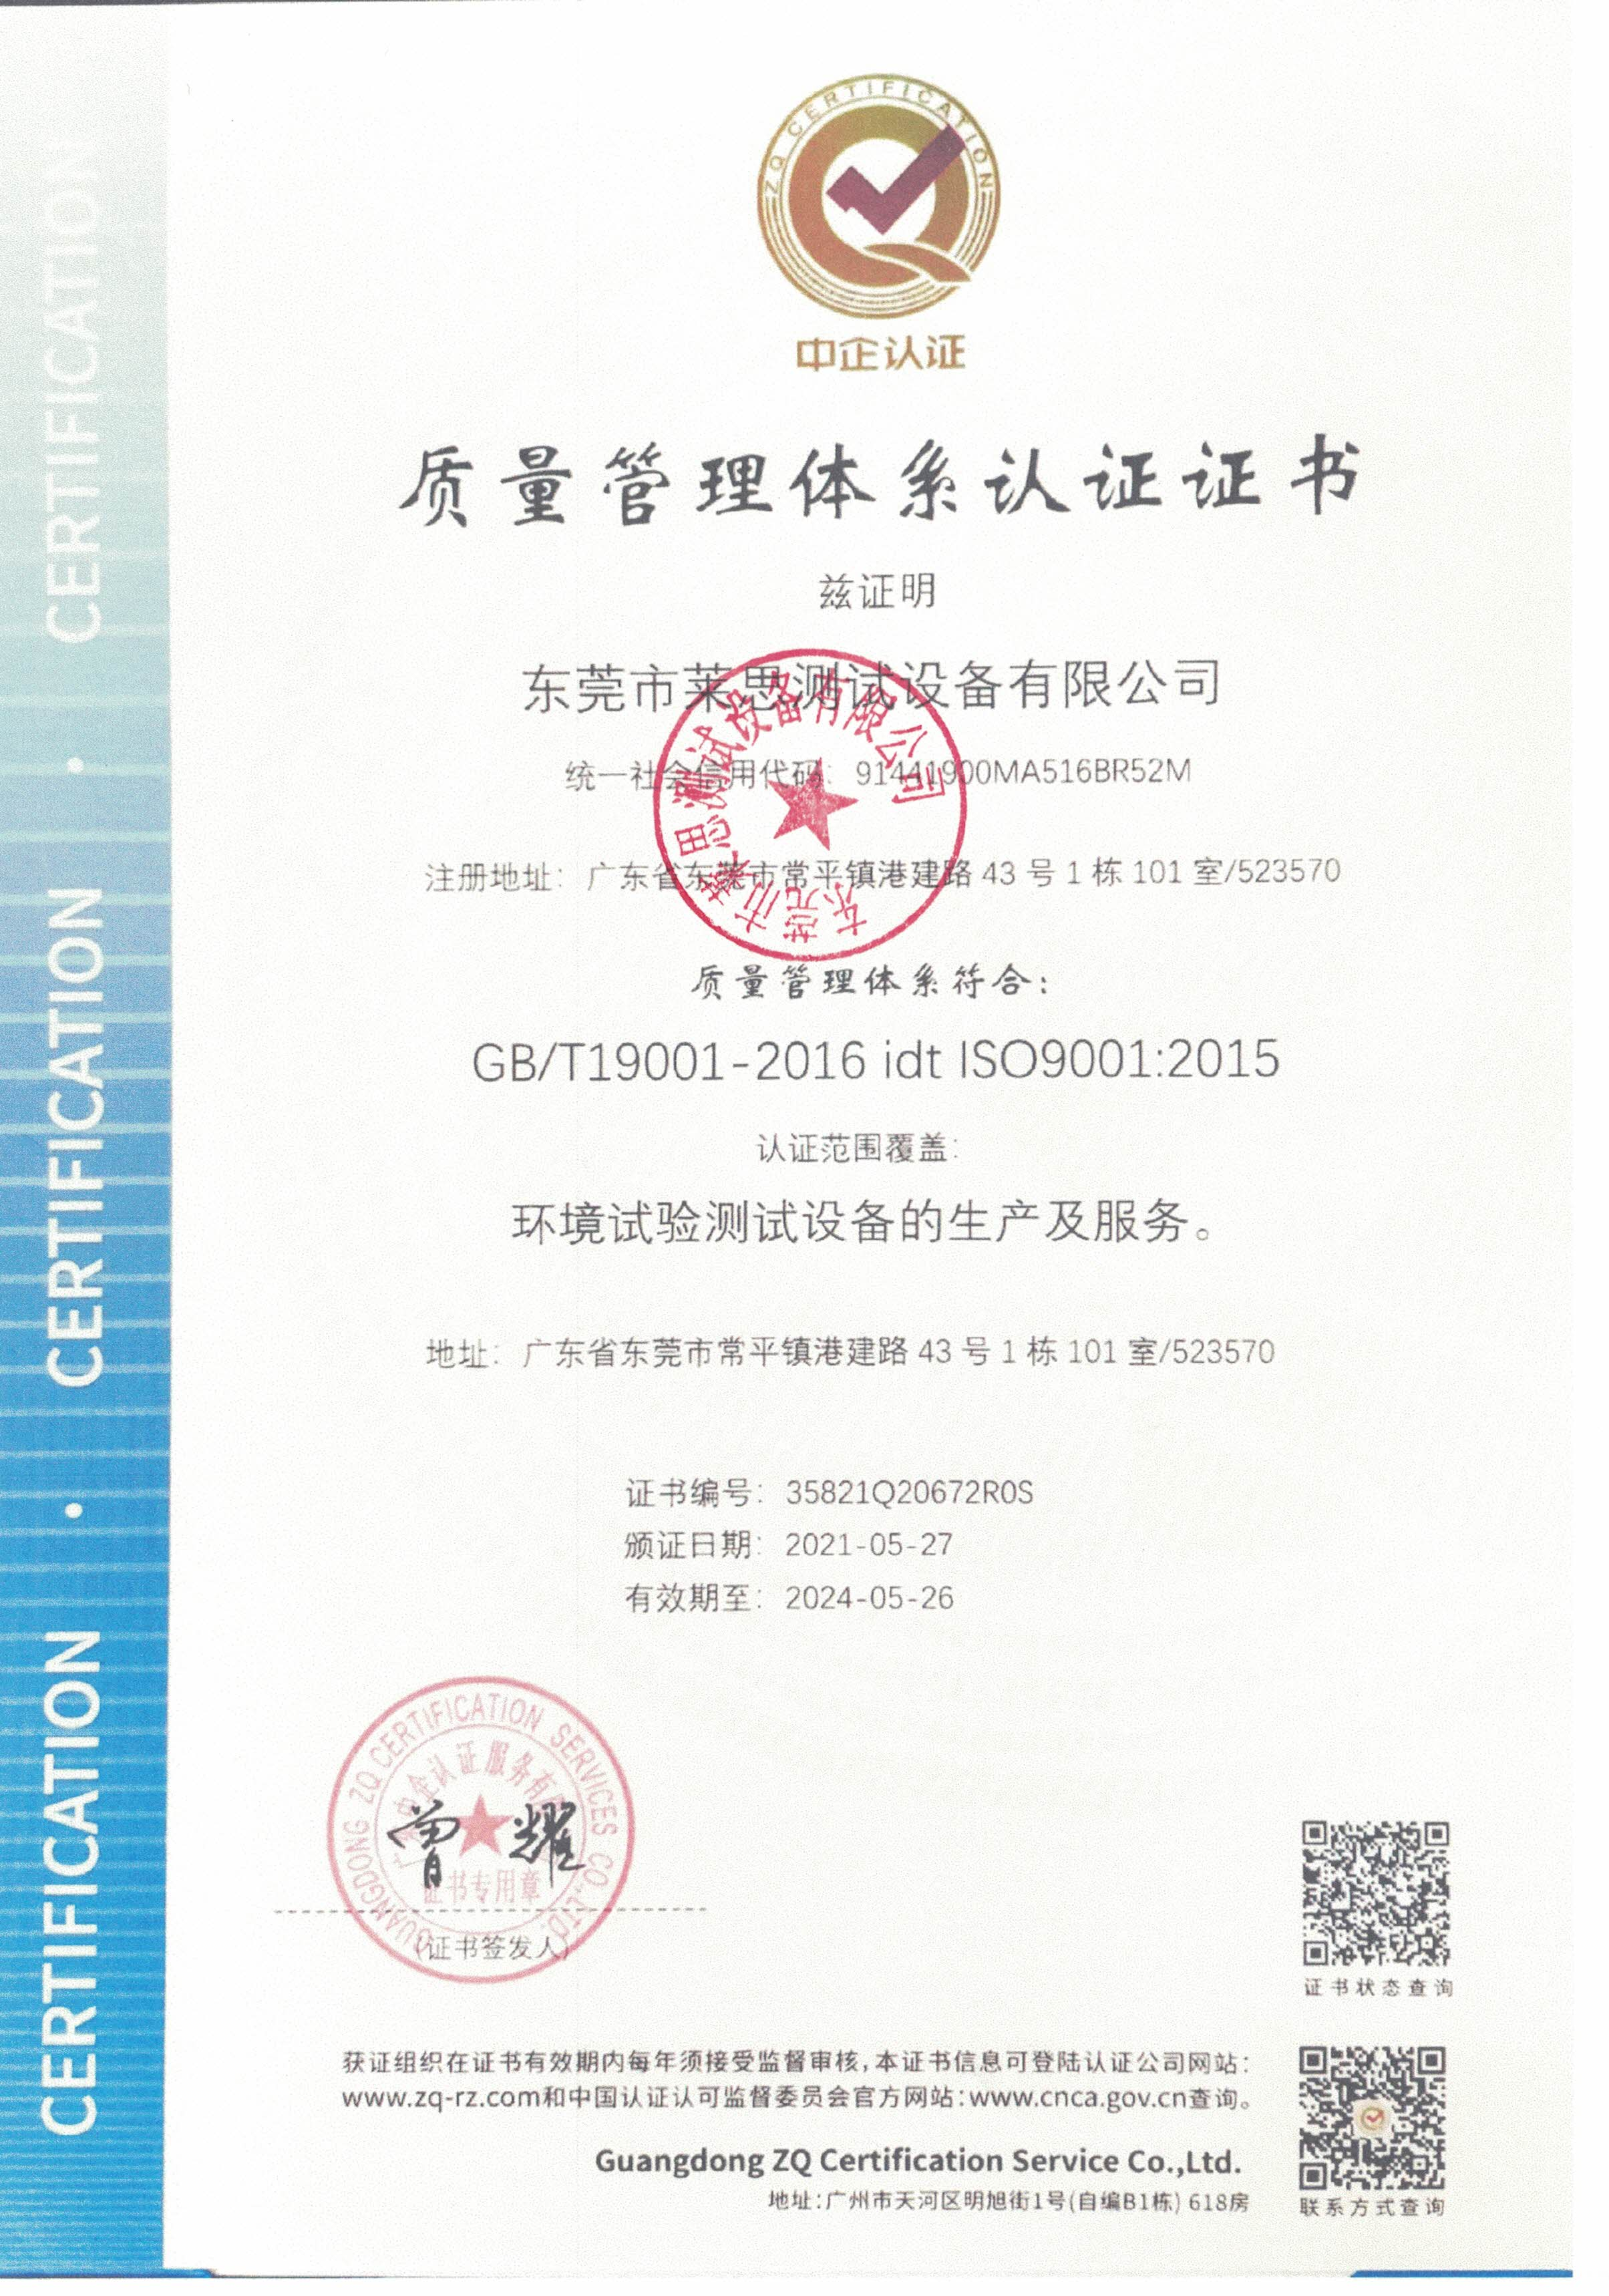 ISO盖章扫描件-中文.jpg